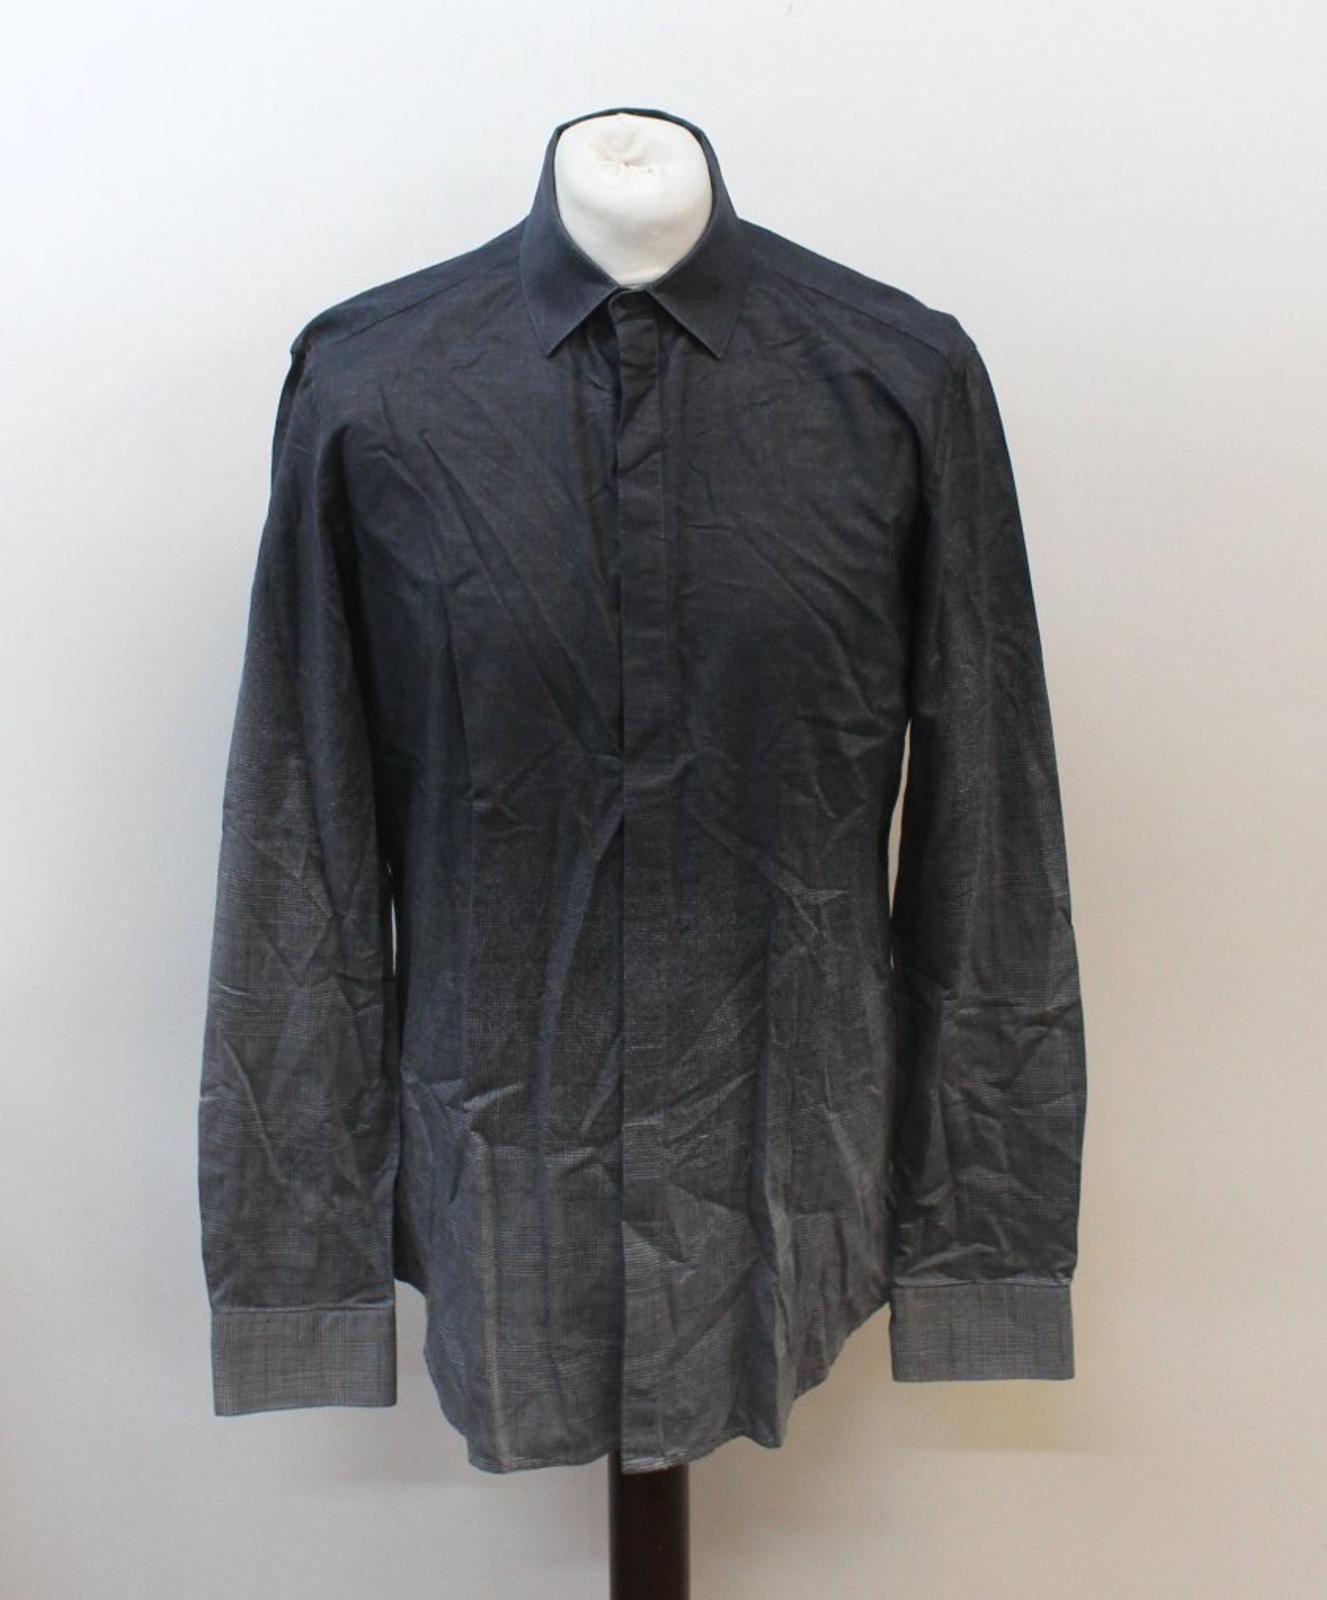 Neil-Barrett-Hombre-Luz-Gris-Oscuro-Algodon-Slim-Fit-Camisa-Cuello-Ombre-16-5-034-42cm